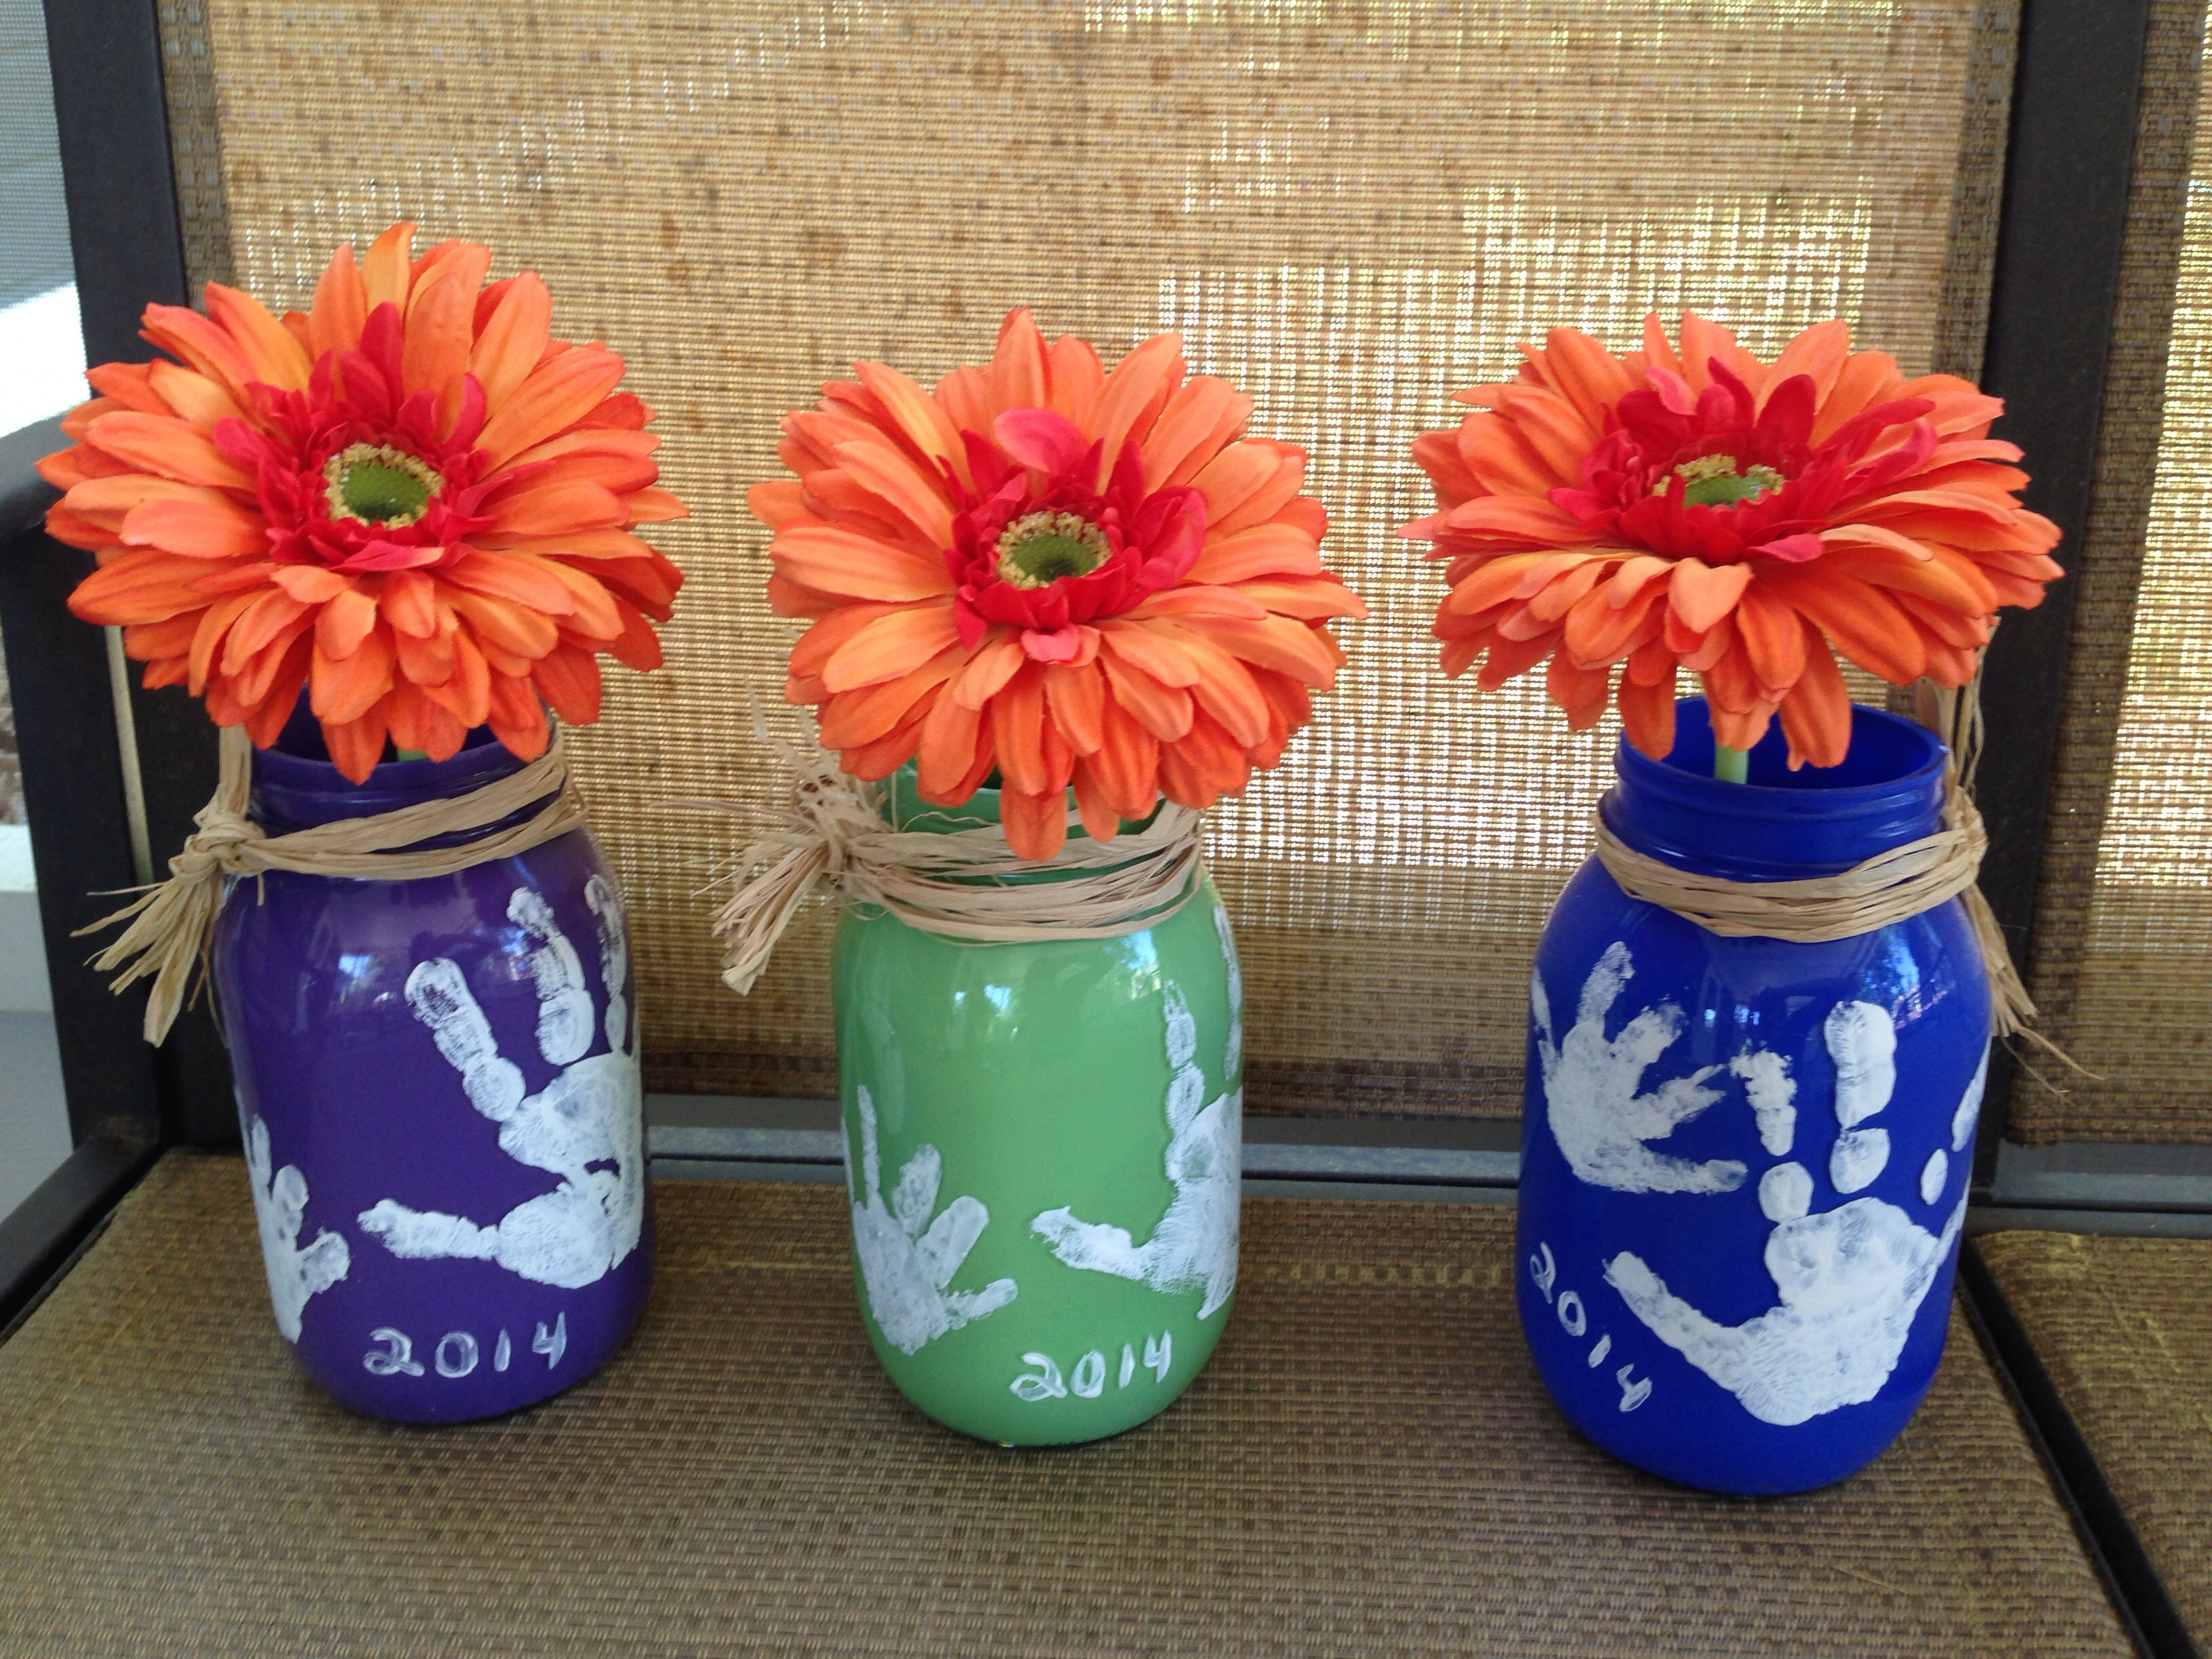 Mothers day vases mason jars with acrylic paint handprints of mothers day vases mason jars with acrylic paint handprints of kidsgrandchildren reviewsmspy